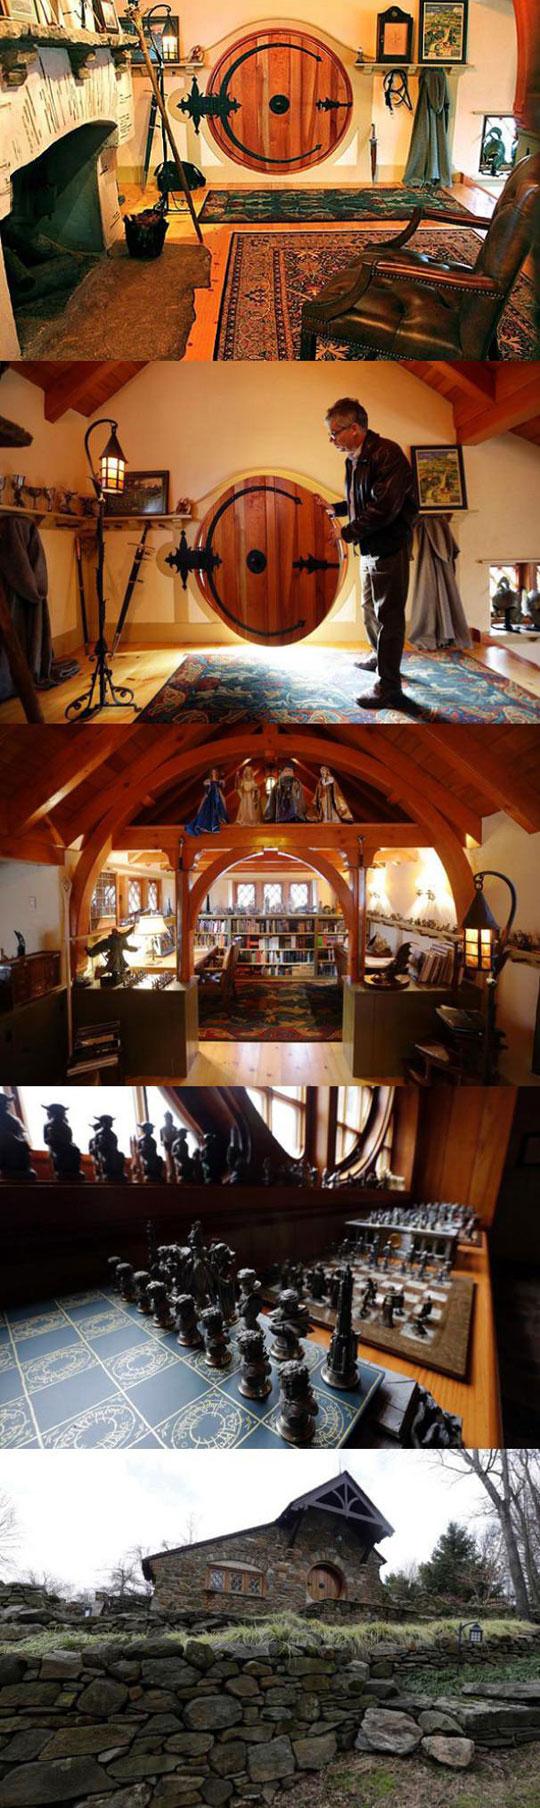 cool-real-life-Hobbit-home-interior